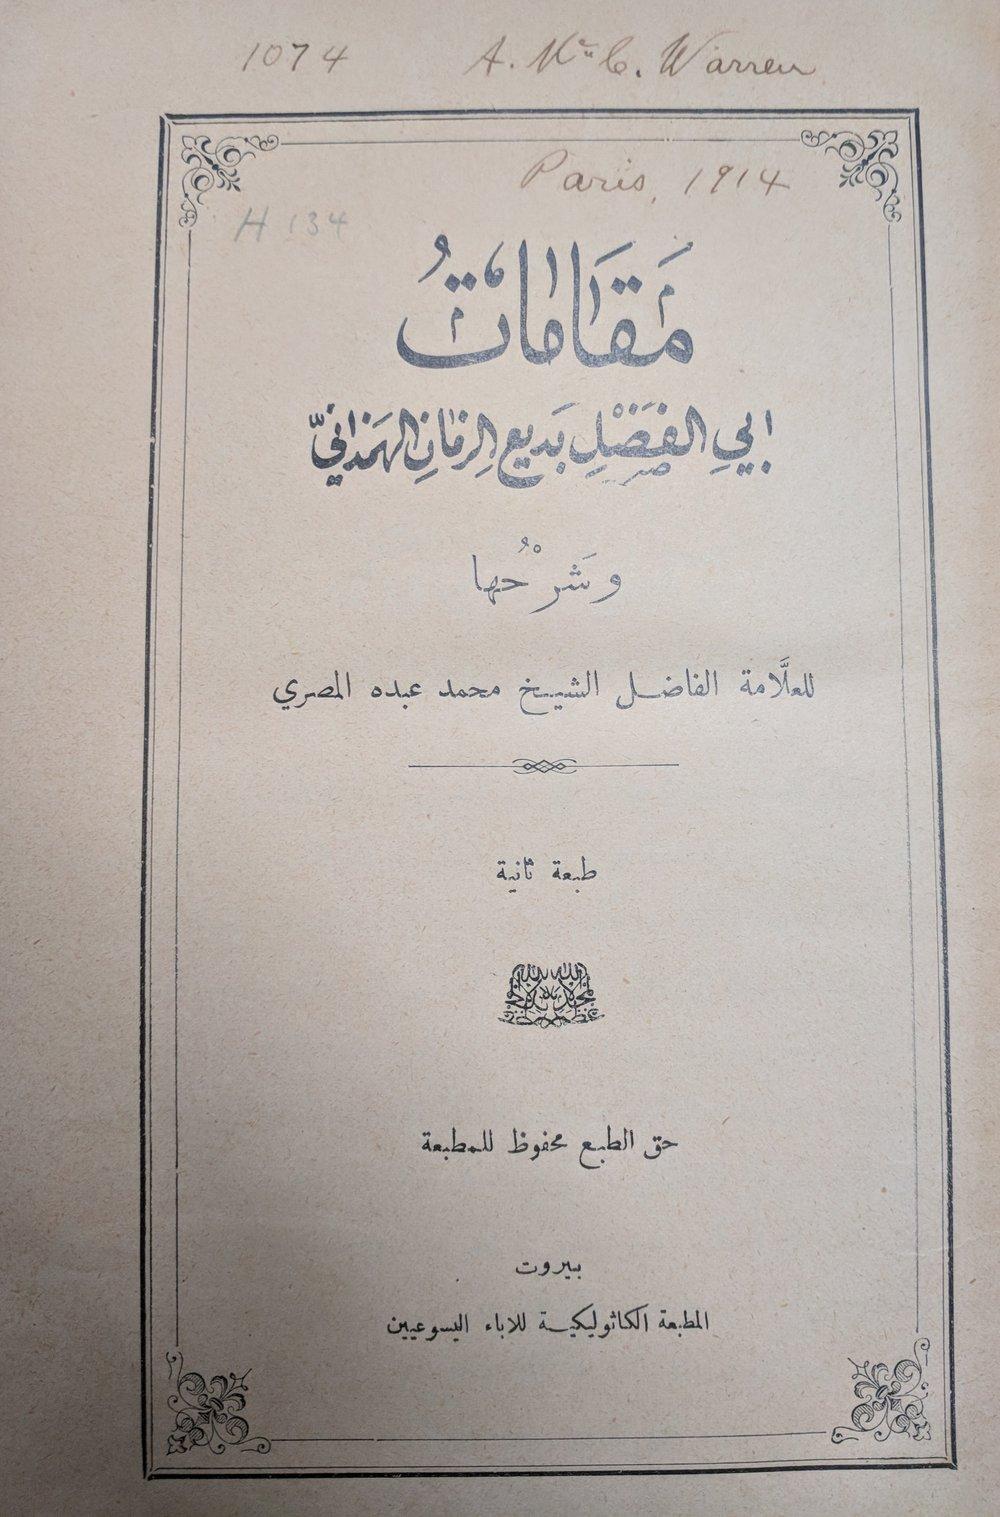 Maqāmāt Abī al-Faḍl Badīʻ al-Zamān al-Hamadhānī wa-sharḥuhā li-Muḥammad ʻAbduh al-Miṣrī.  Bayrūt: al-Maṭbaʻah al-Kāthūlīkīyyah, 1908.